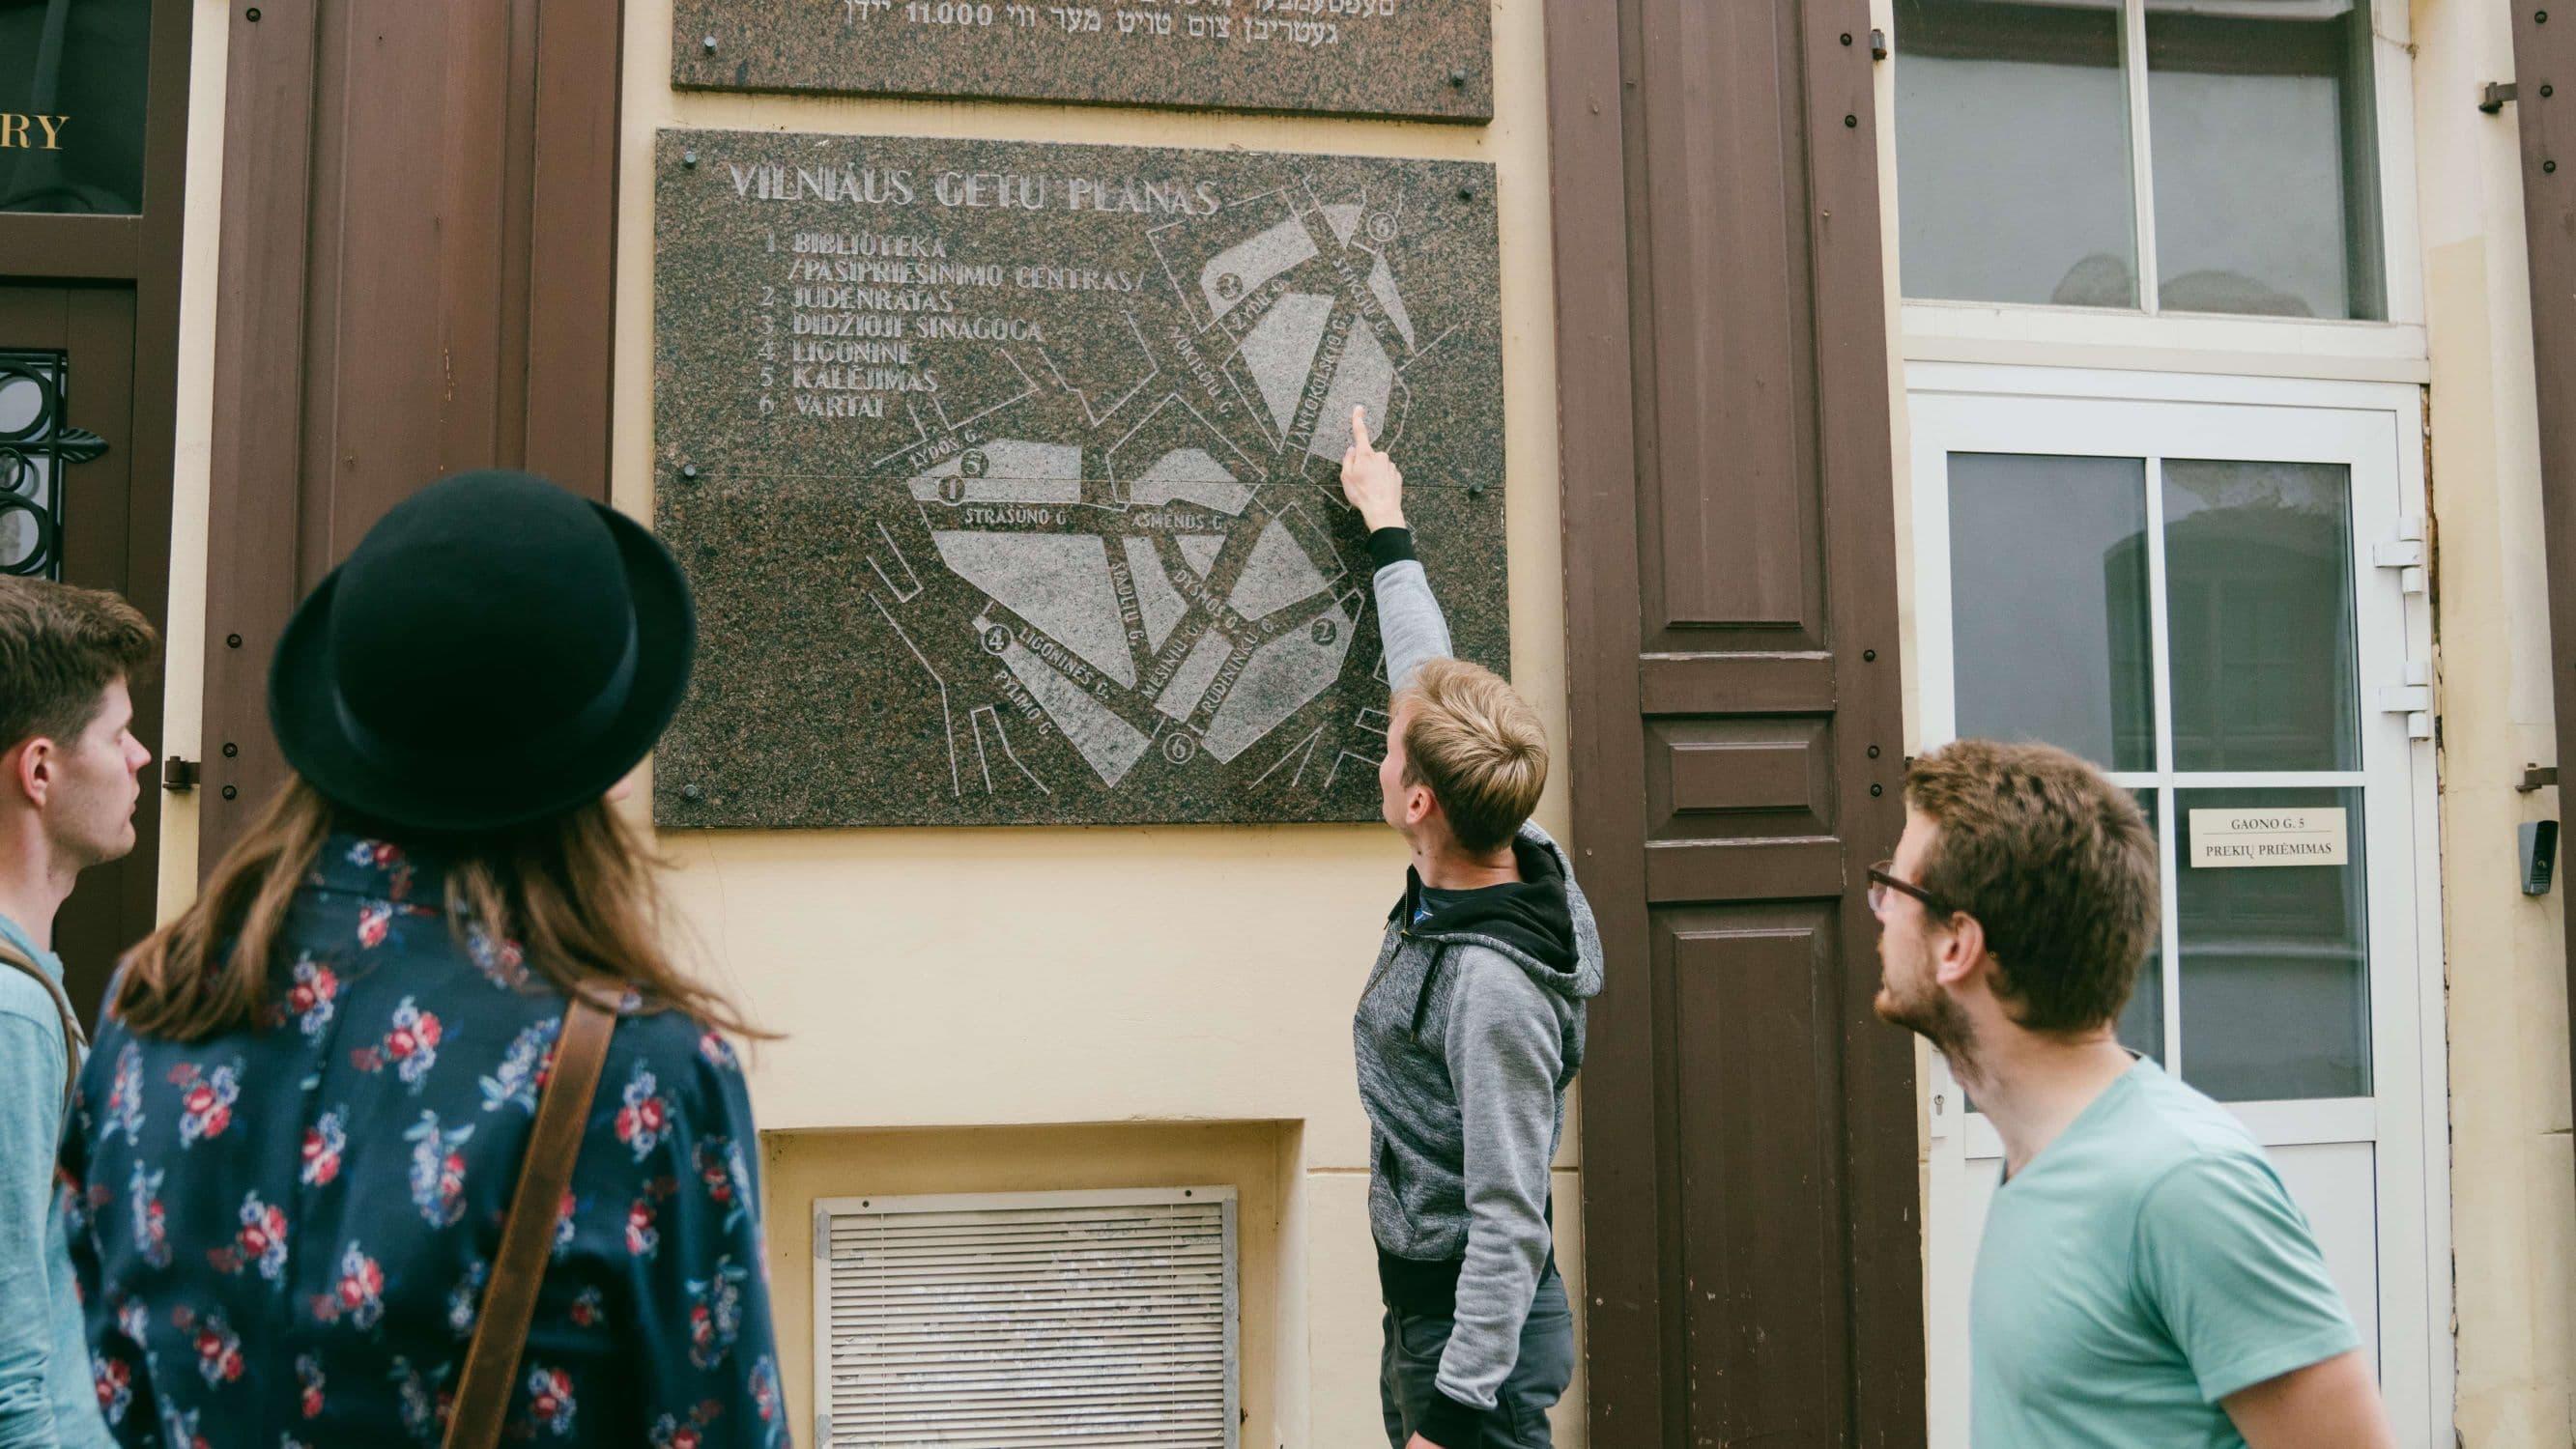 Vilna small ghetto discovered on Jewish Vilnius tour